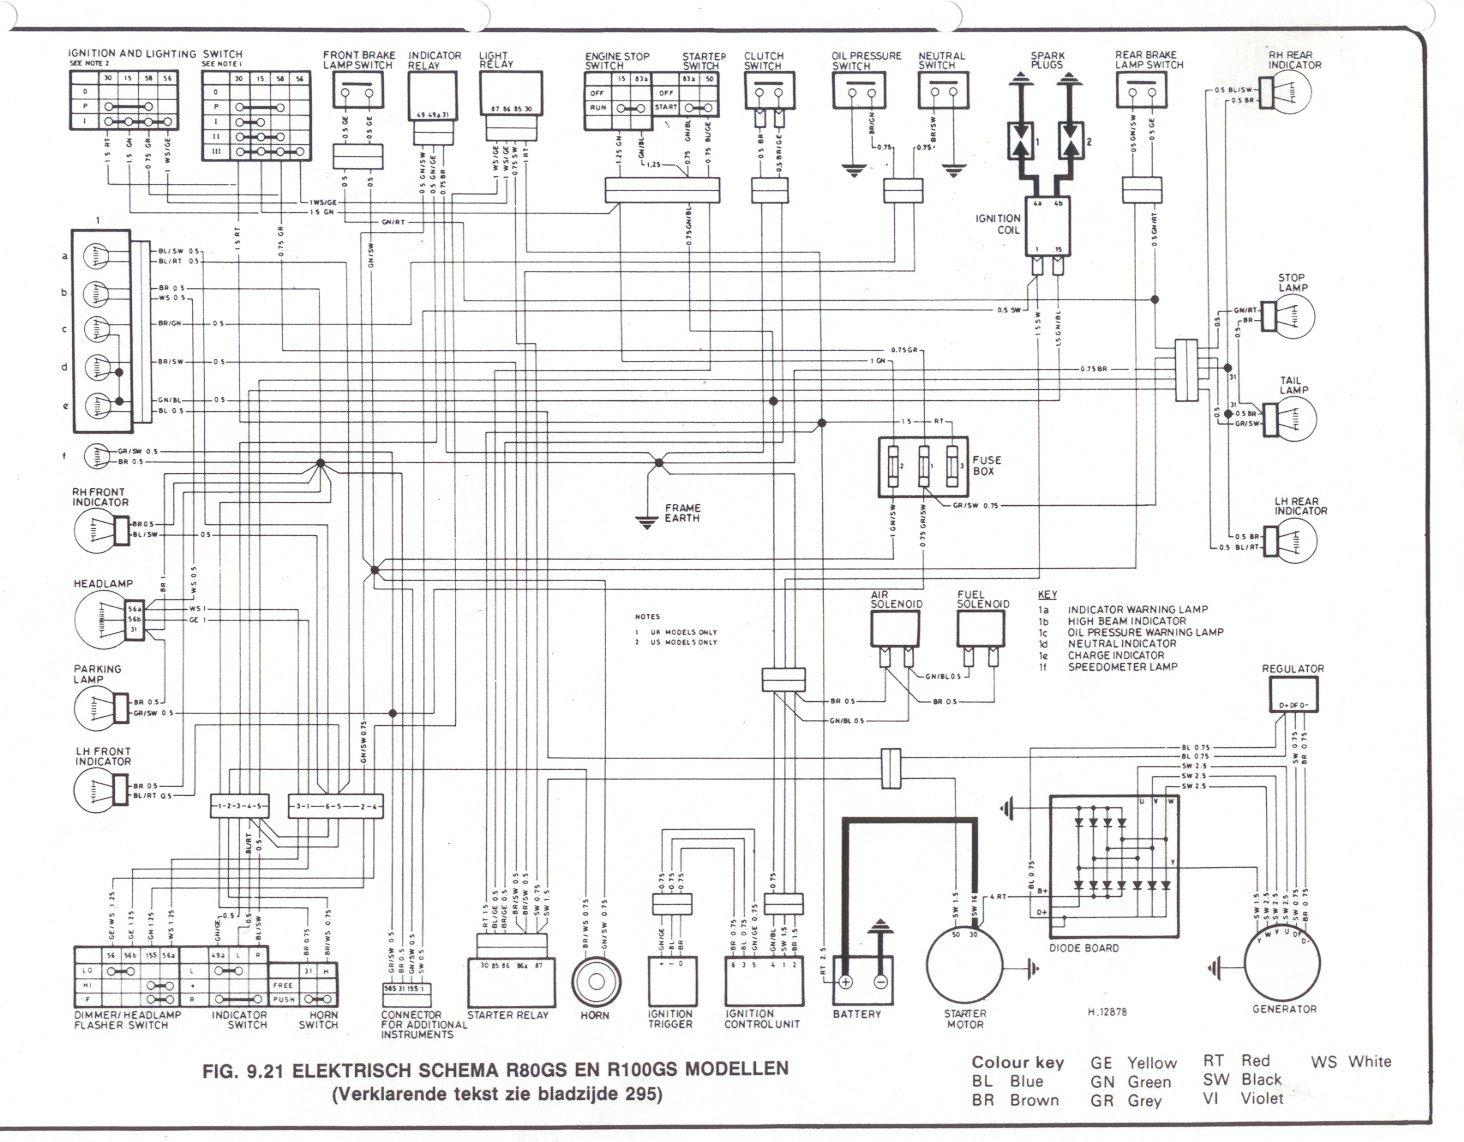 motorcycle wiring diagrams r90 wiring diagram third level1973 bmw r75 5 wiring diagram as well bmw [ 1464 x 1142 Pixel ]